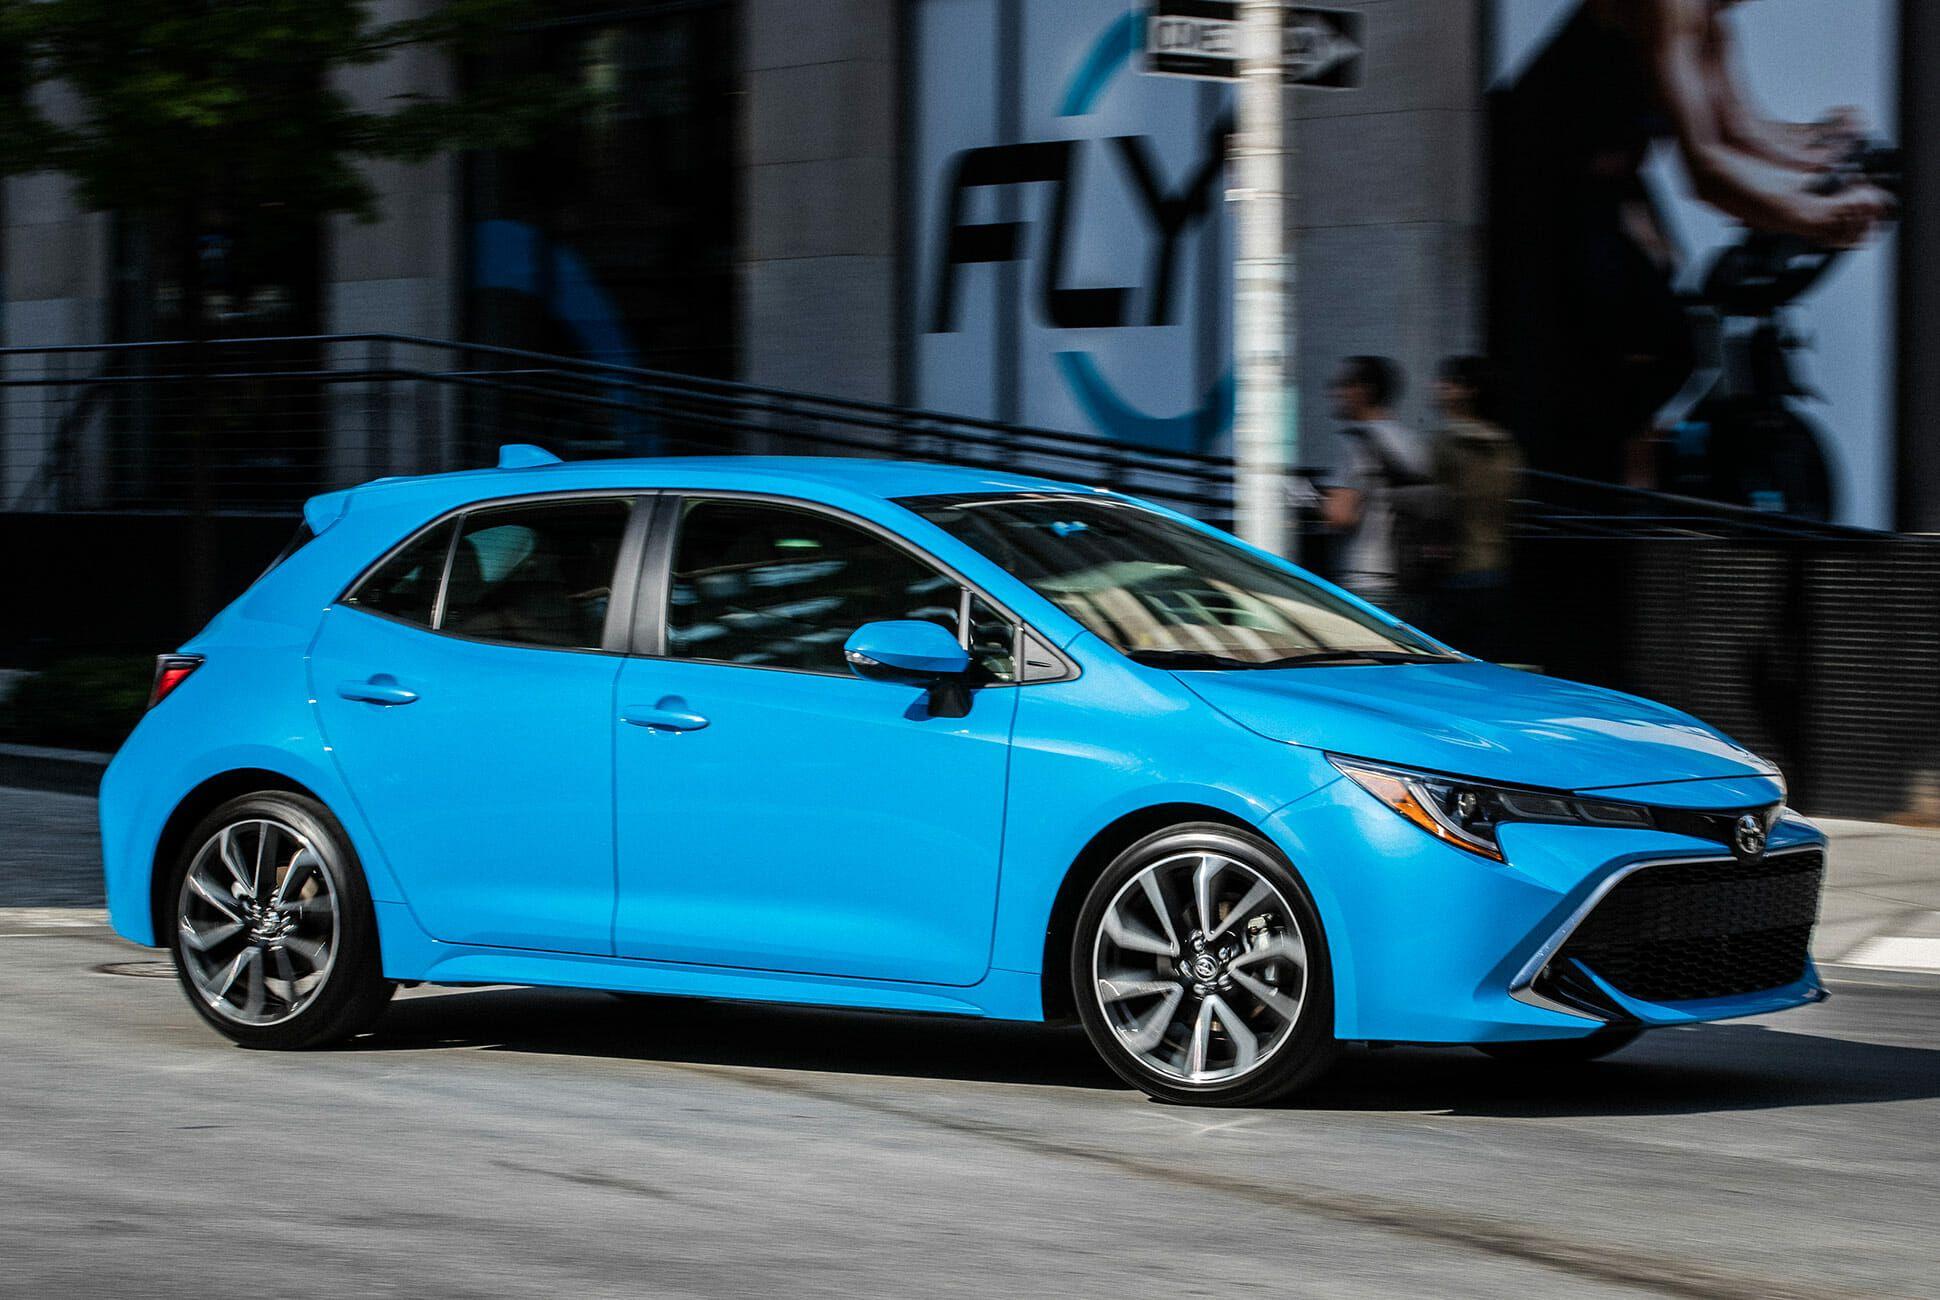 Toyota-Corolla-XSE-Hatch-Review-gear-patrol-slide-6